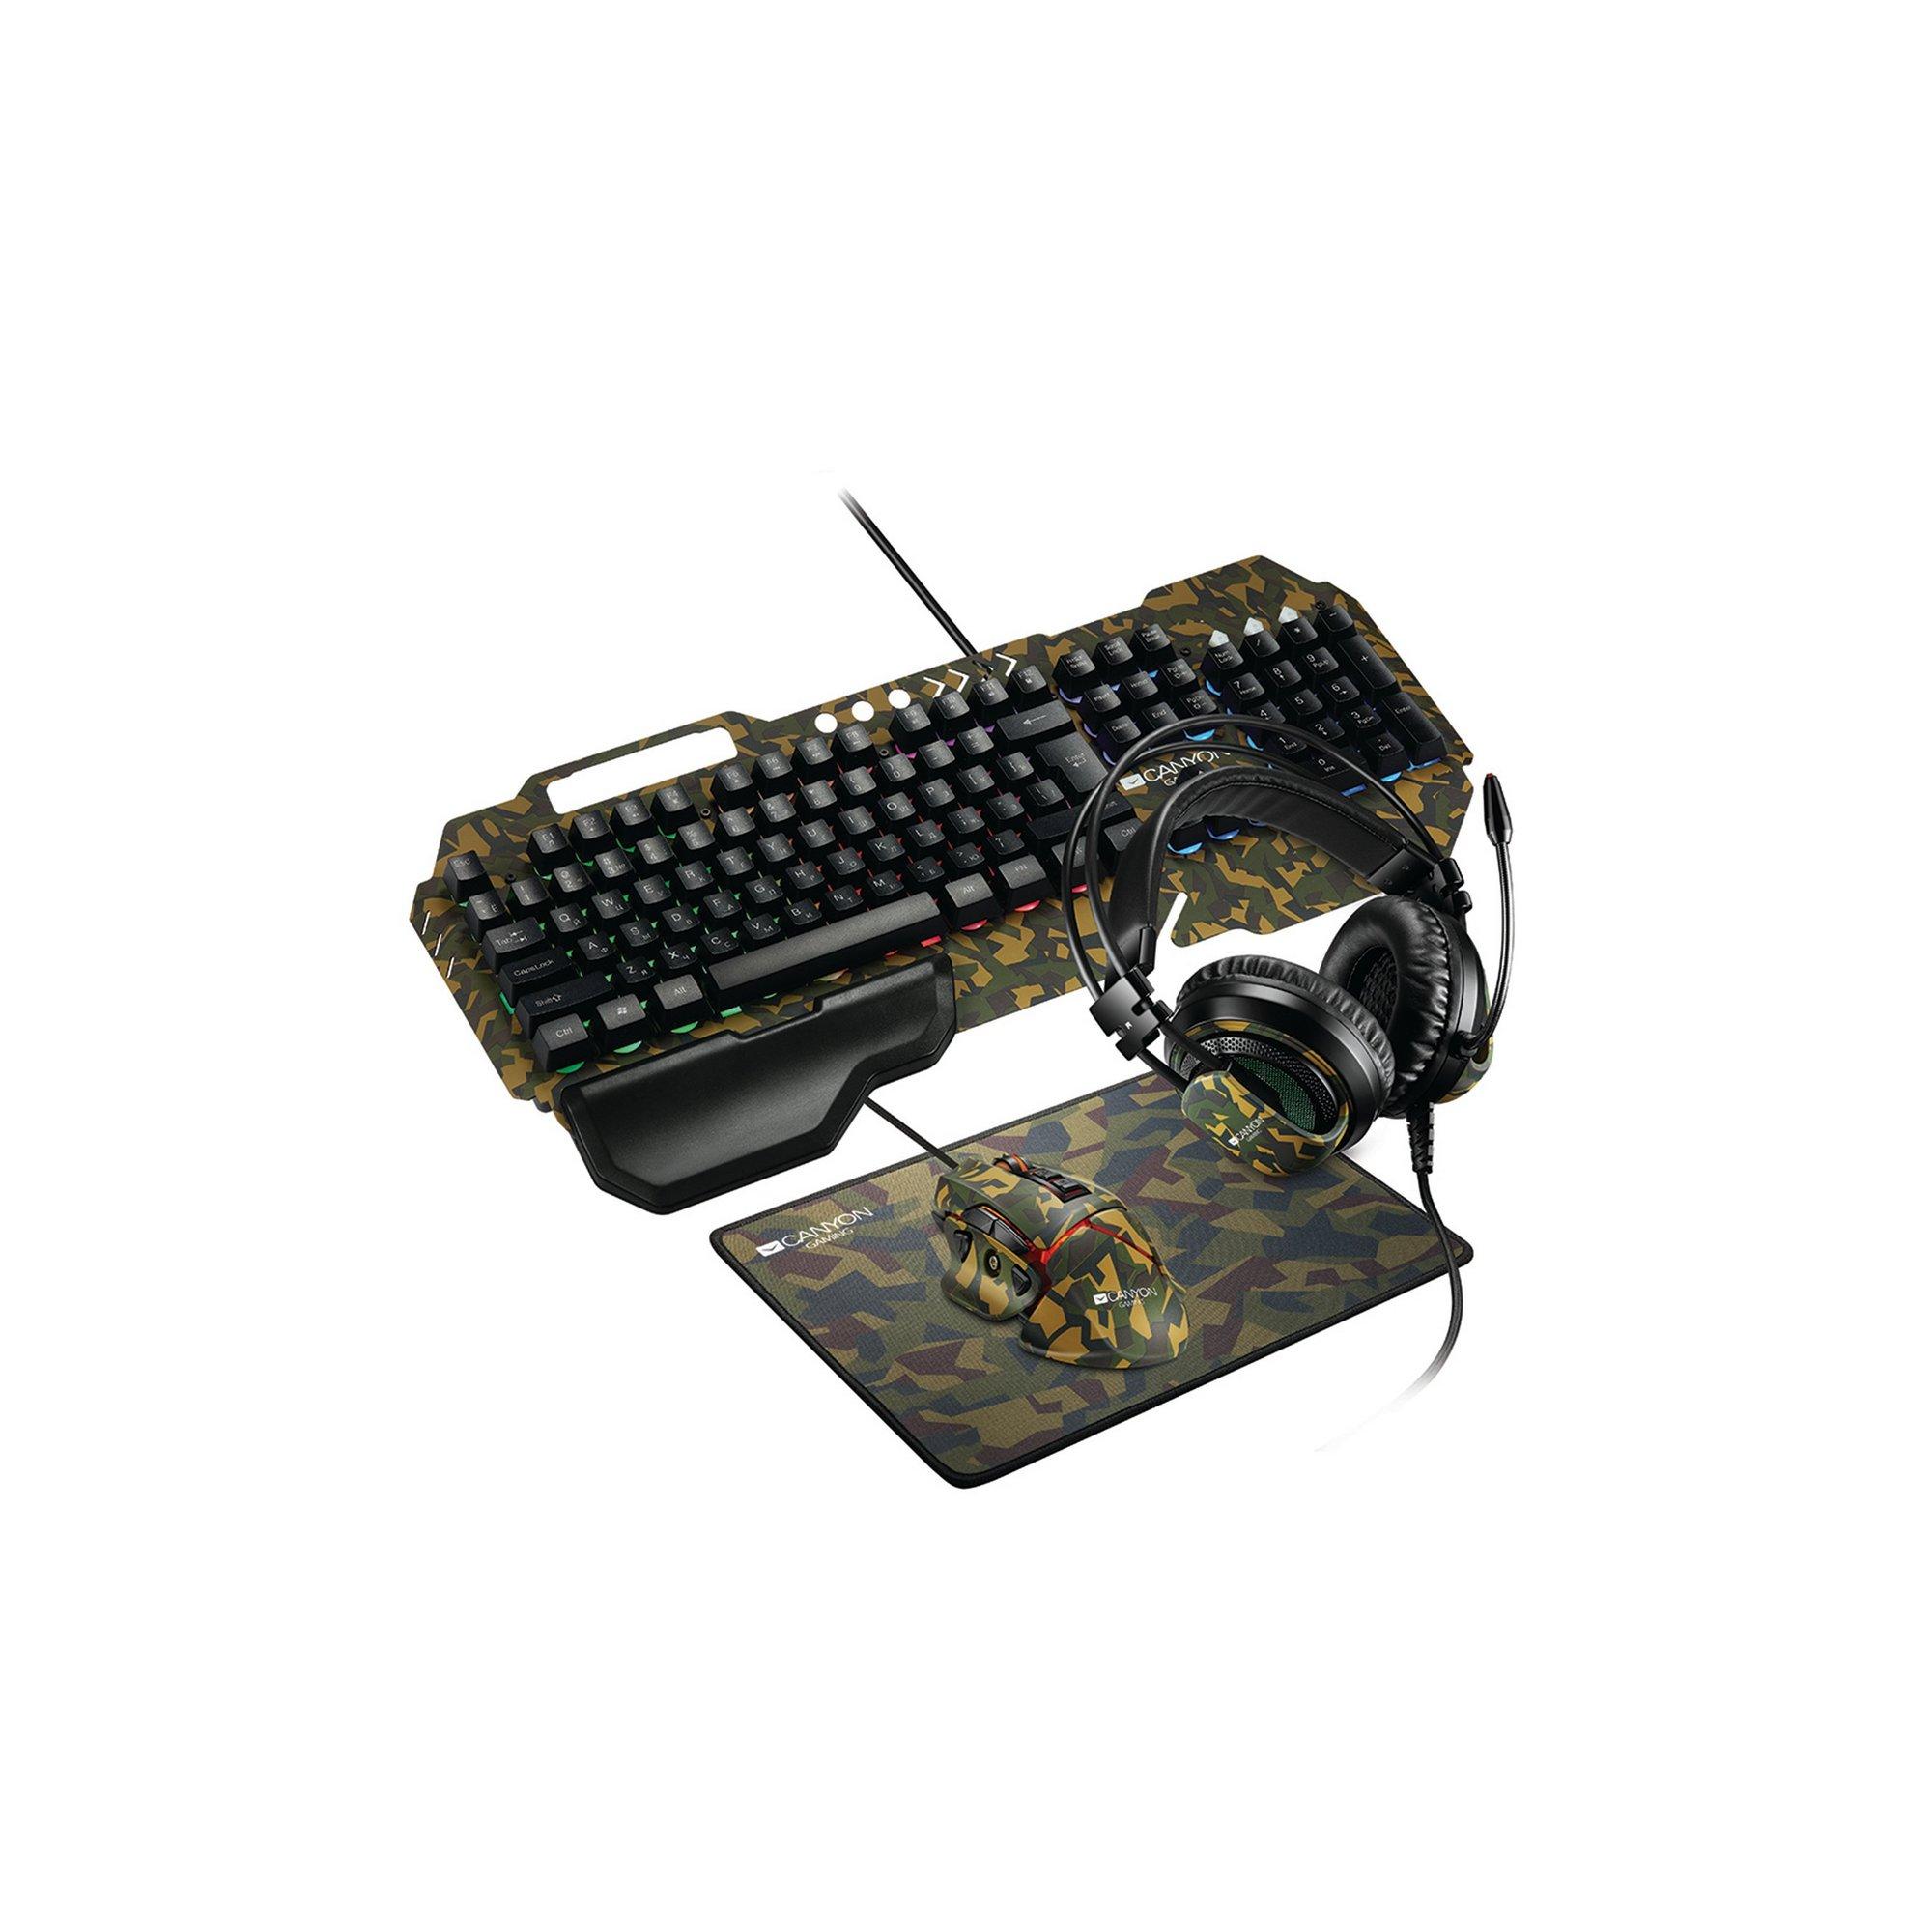 Image of Canyon Argama 4 Piece Camo Gaming Set